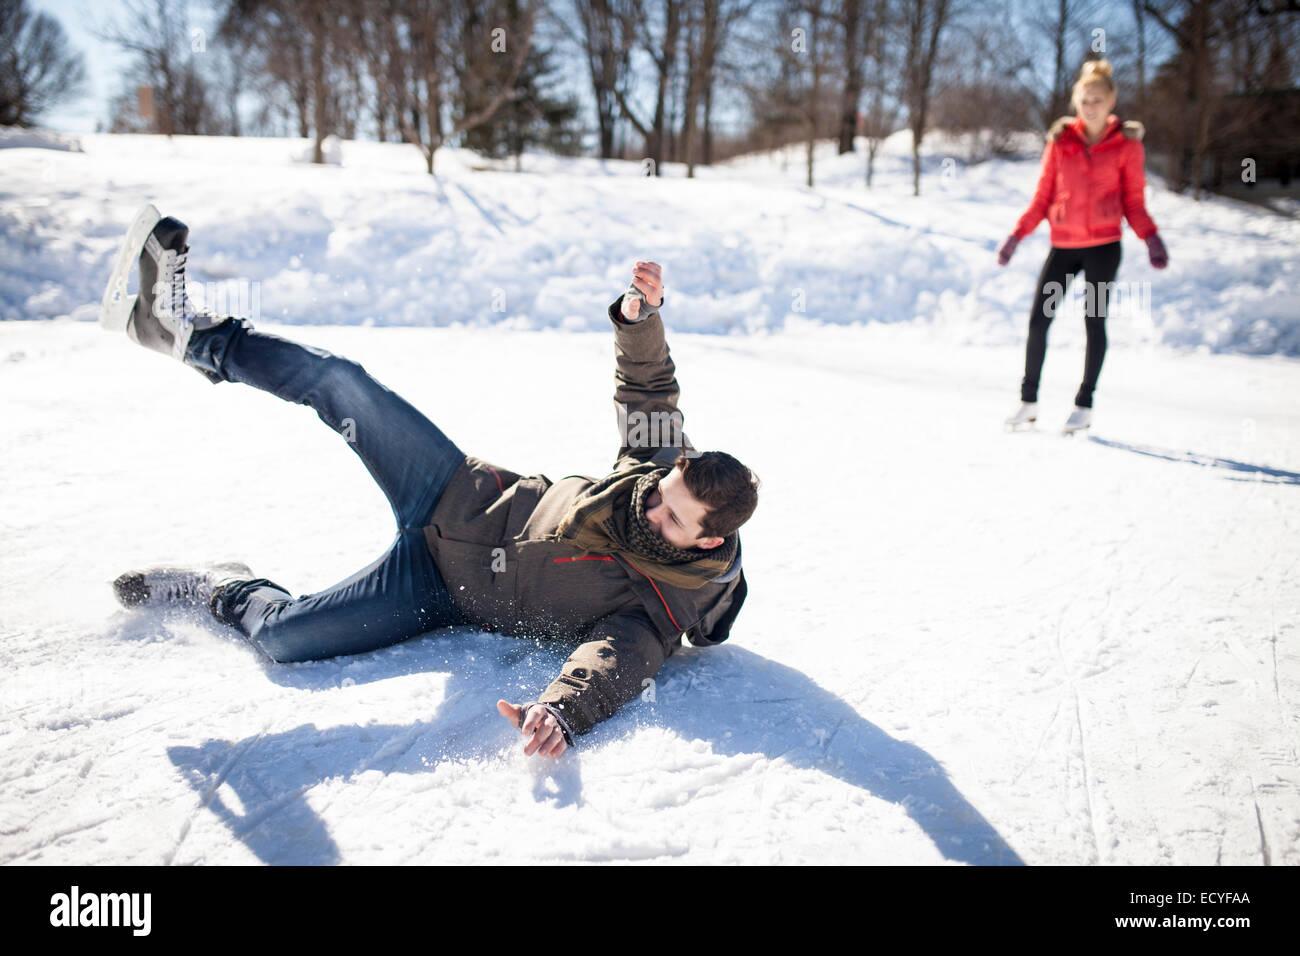 Caucasian man falling while ice skating on frozen lake - Stock Image